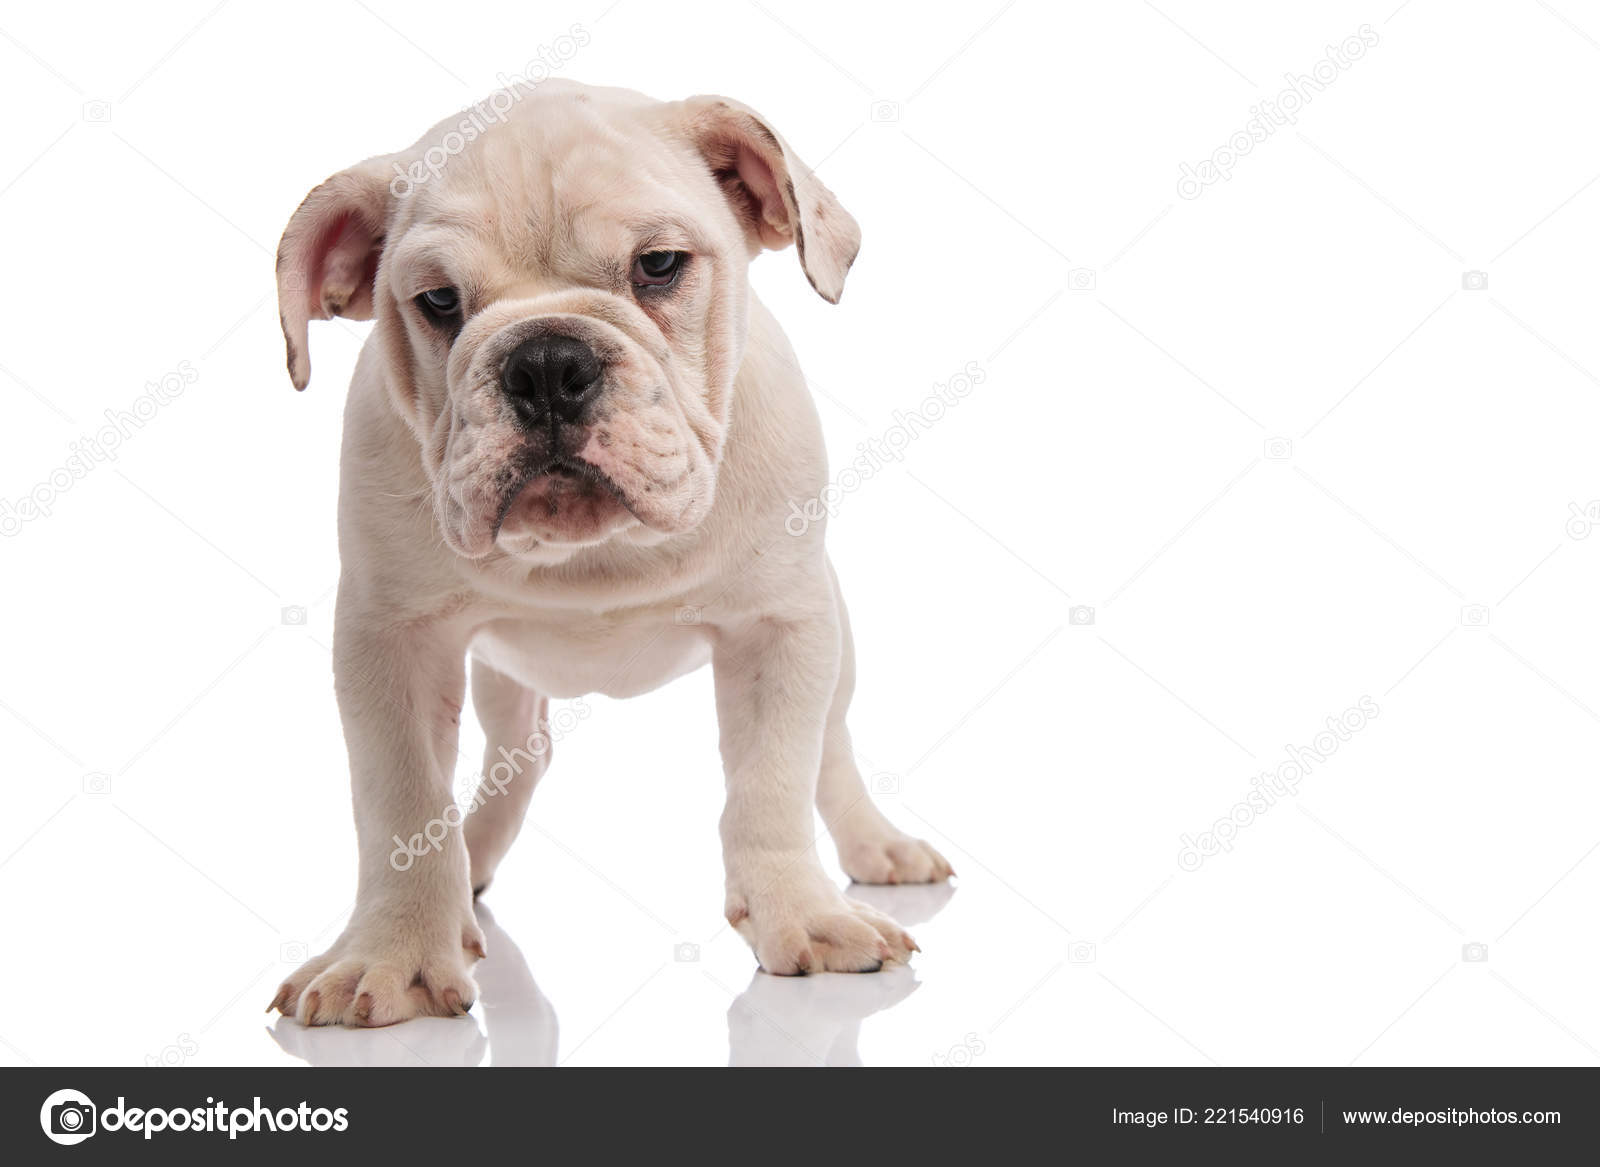 White English Bulldog Puppy Standing White Background Looking Bored Stock Photo C Feedough 221540916